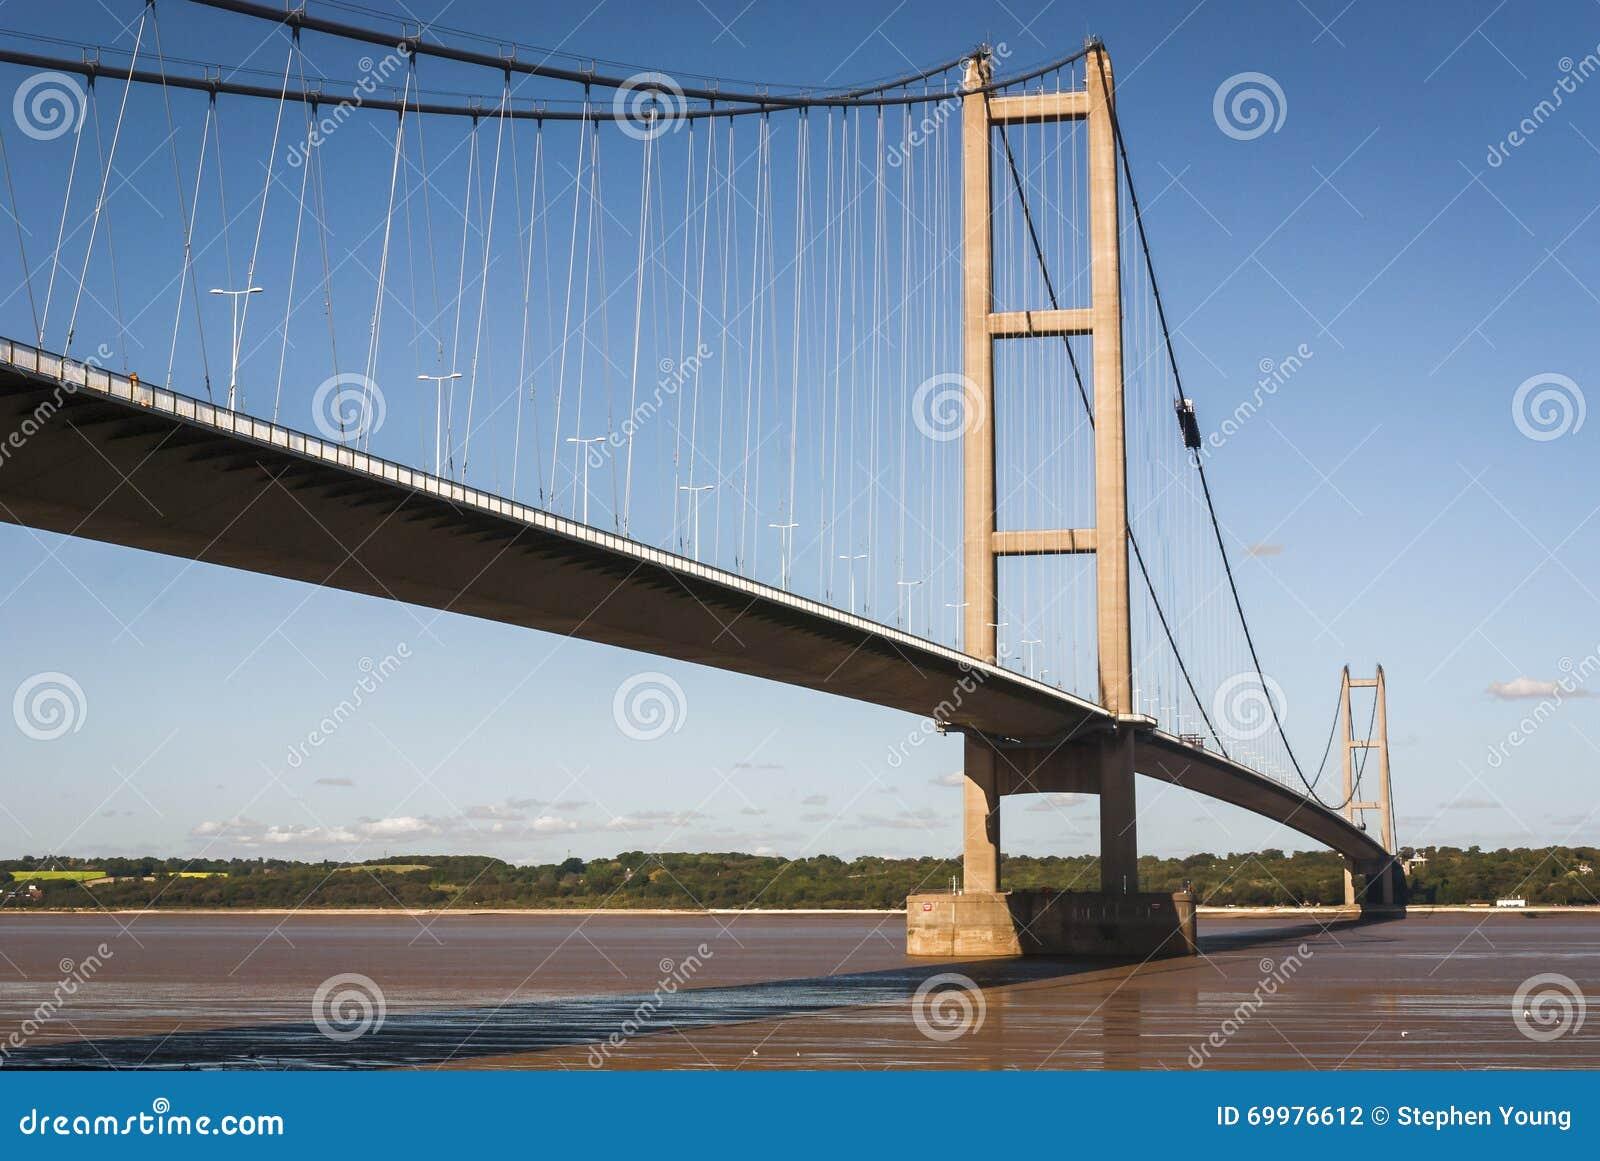 England. East Yorkshire. 2010. The Humber Bridge